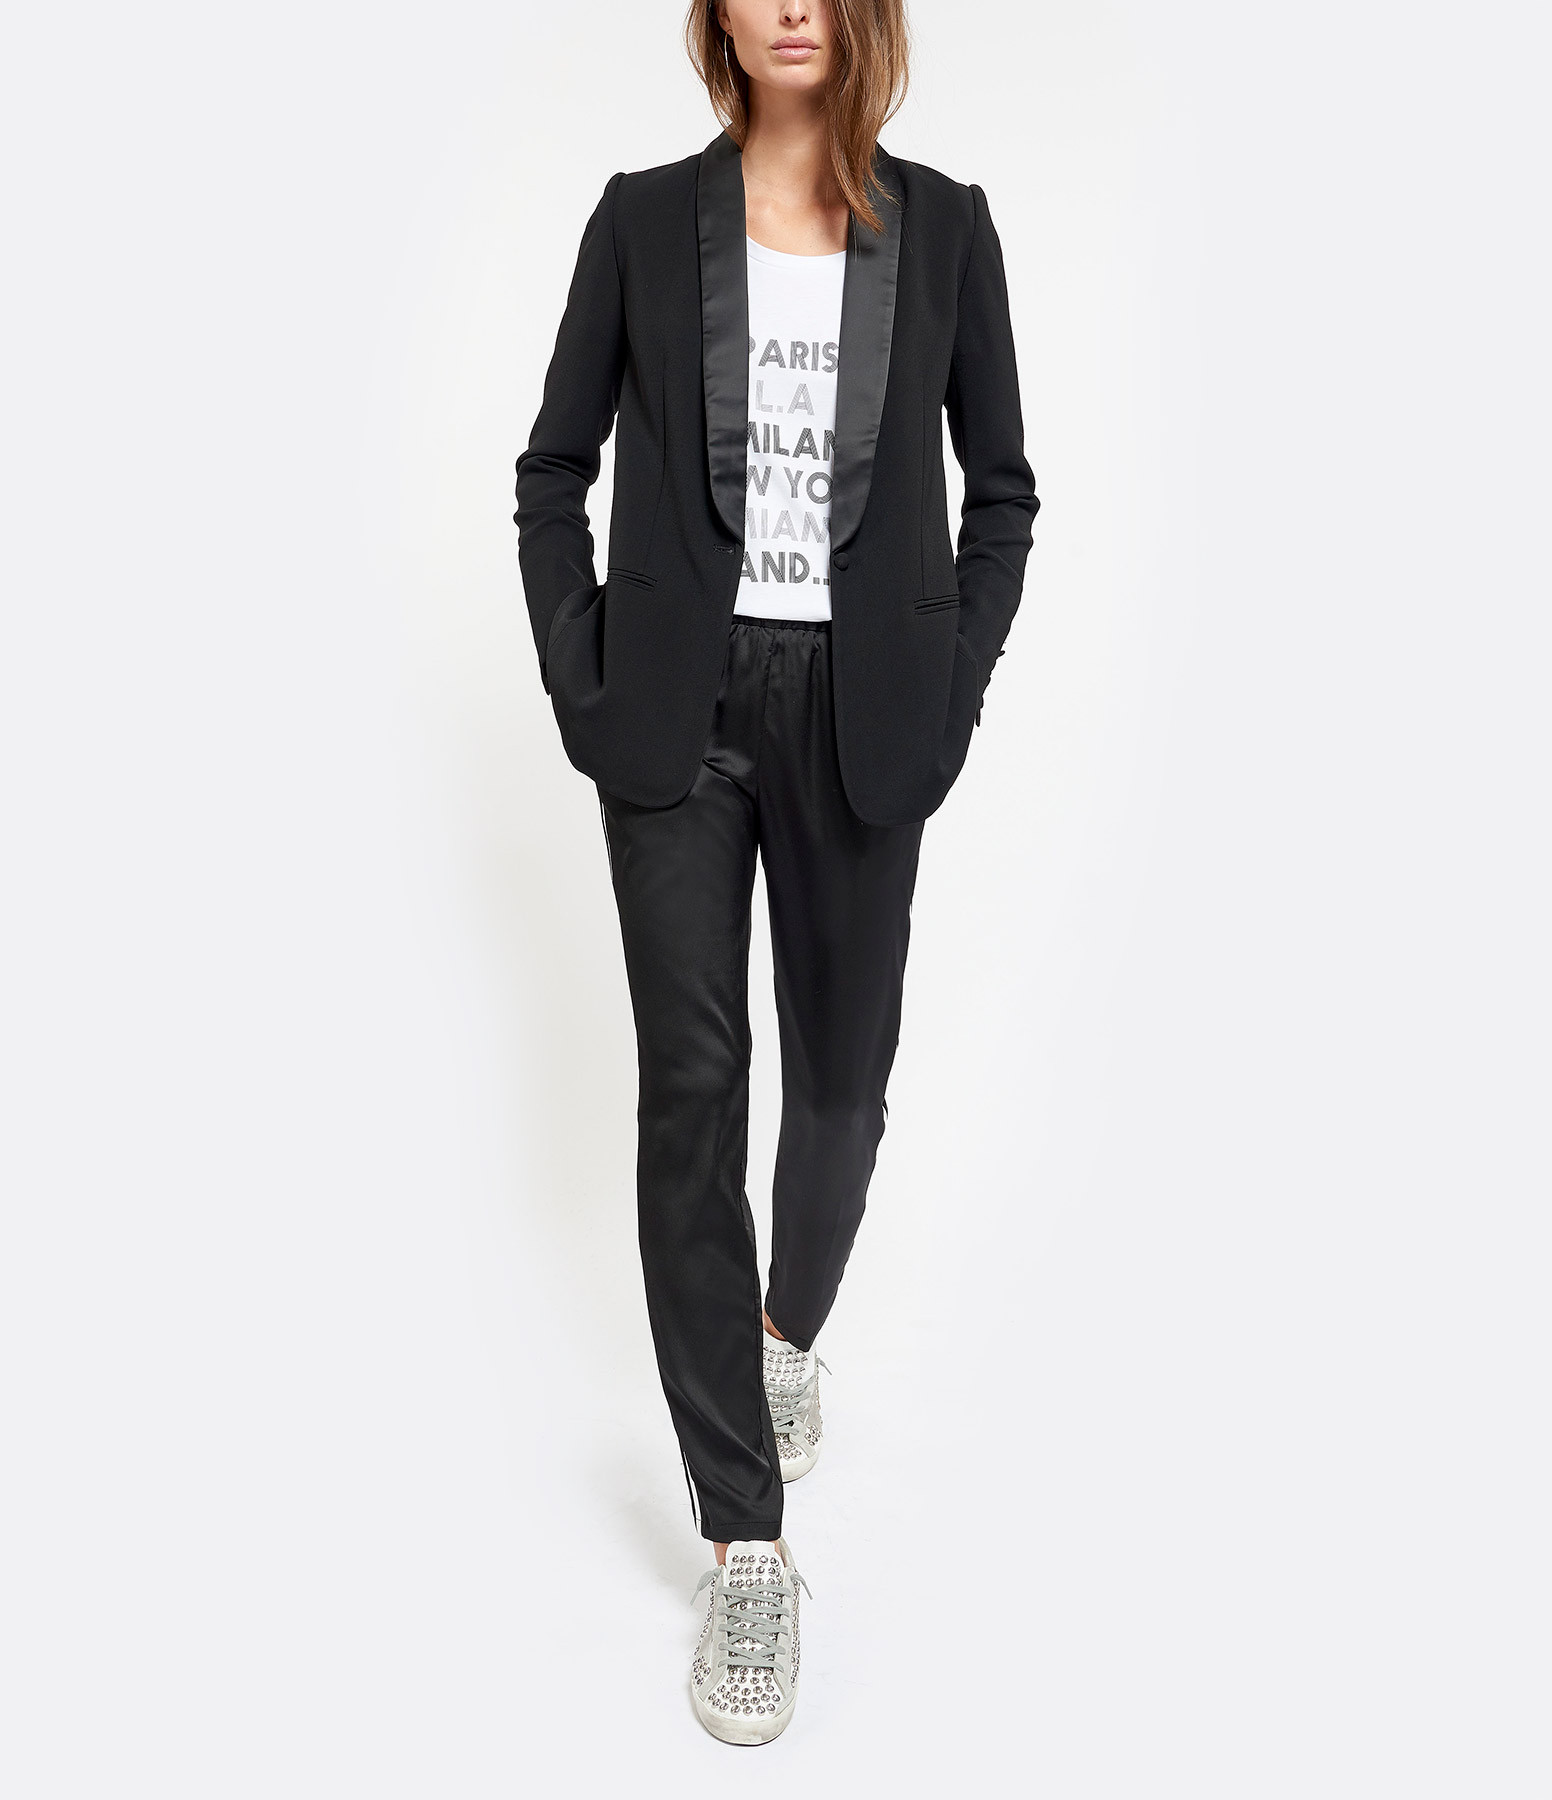 JEANNE VOULAND - Pantalon Cara Bandes Noir Blanc